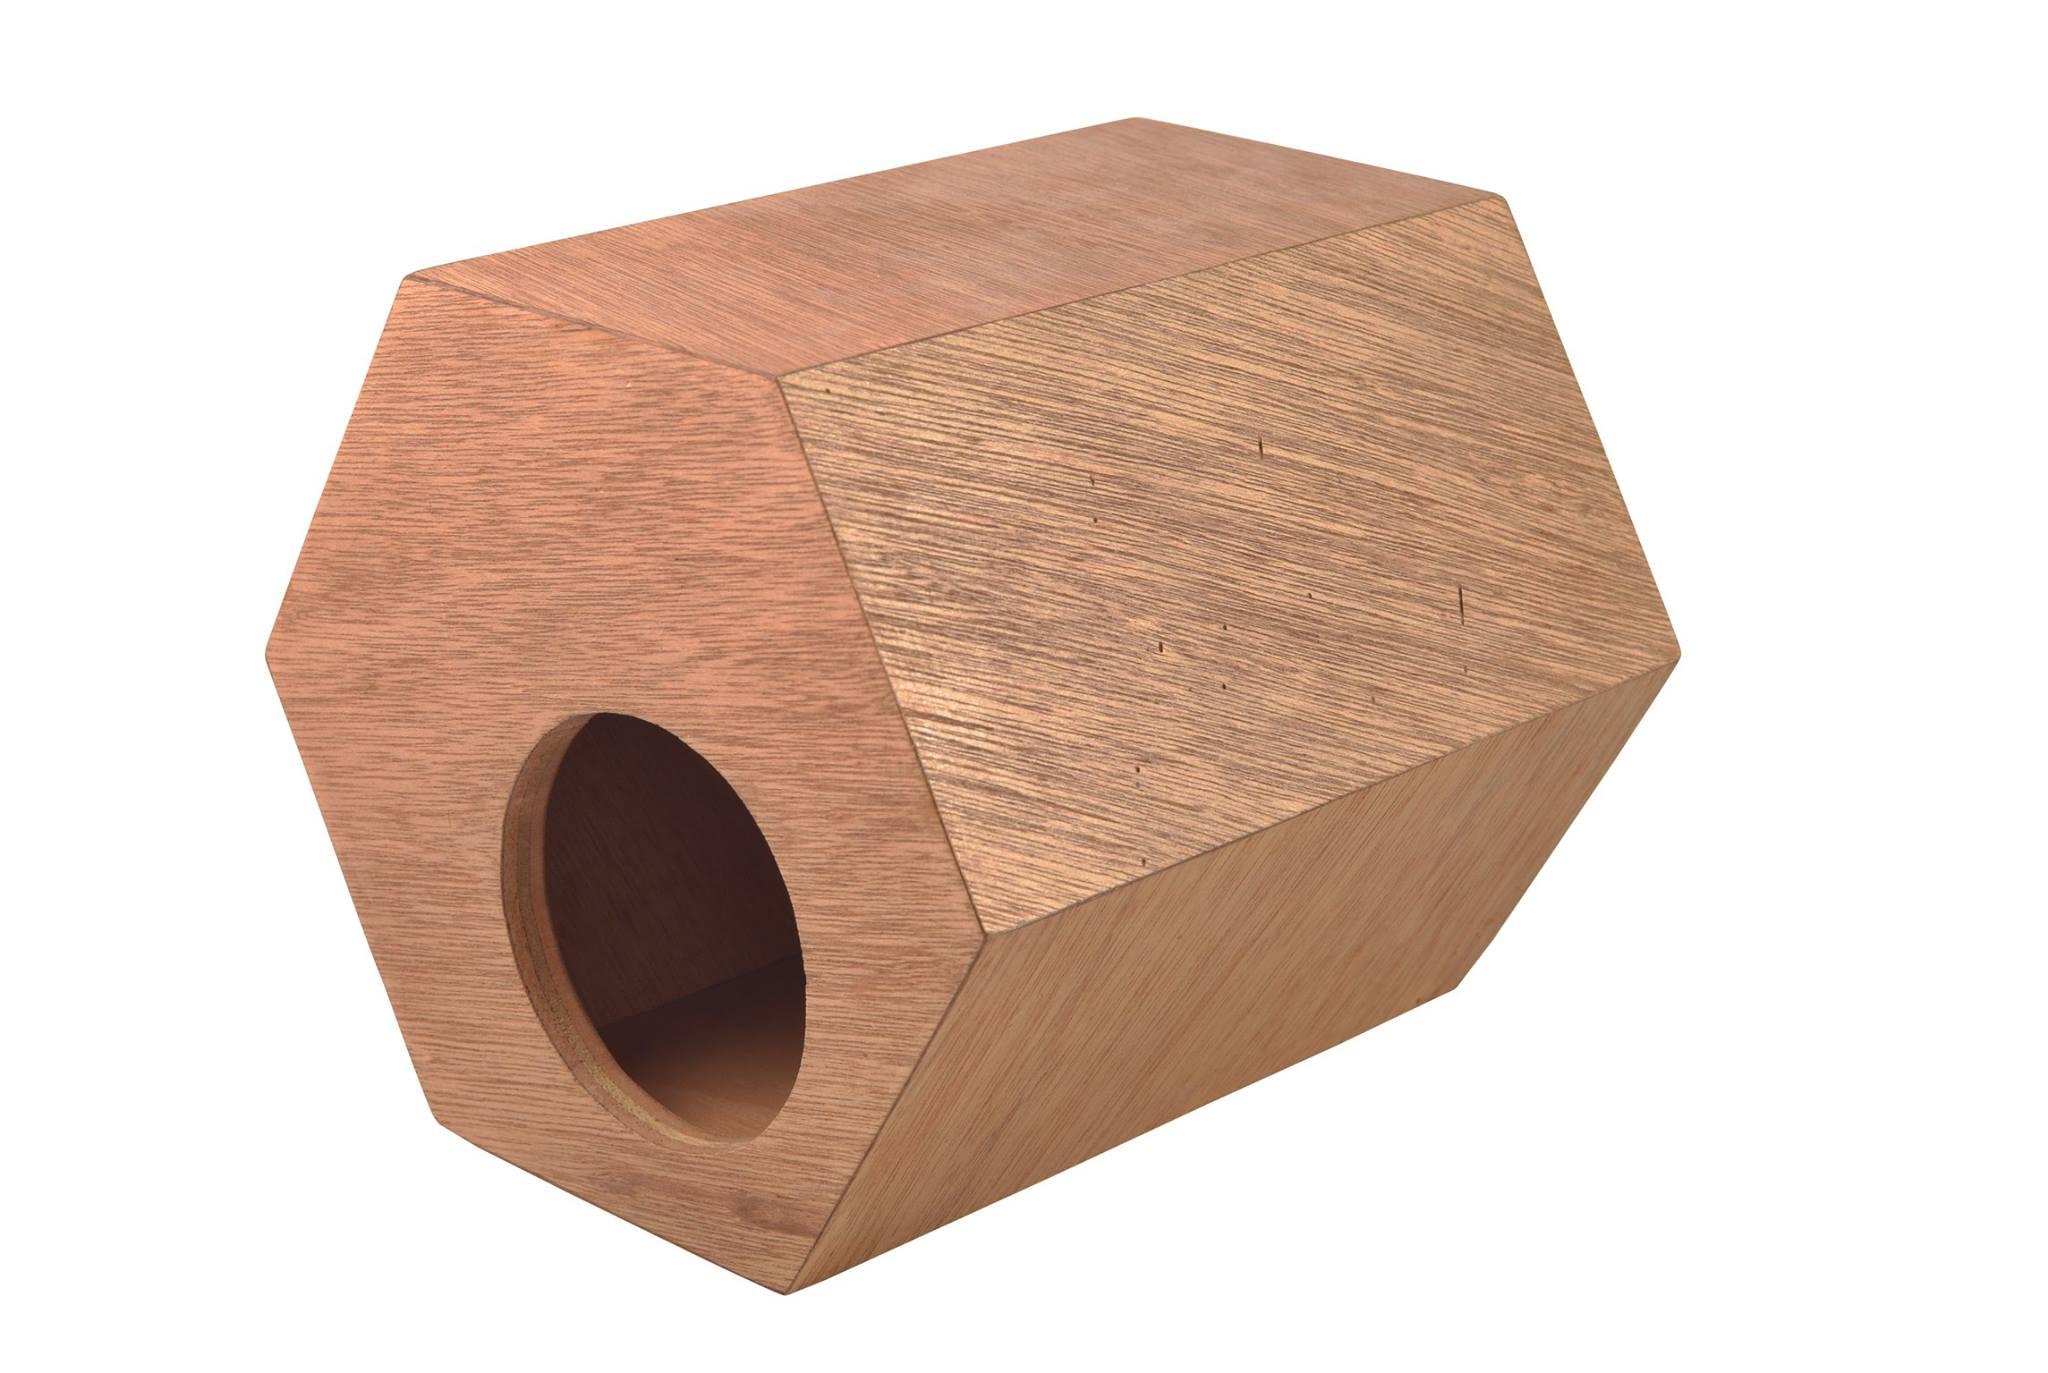 Wooden Hexagon Birdhouse